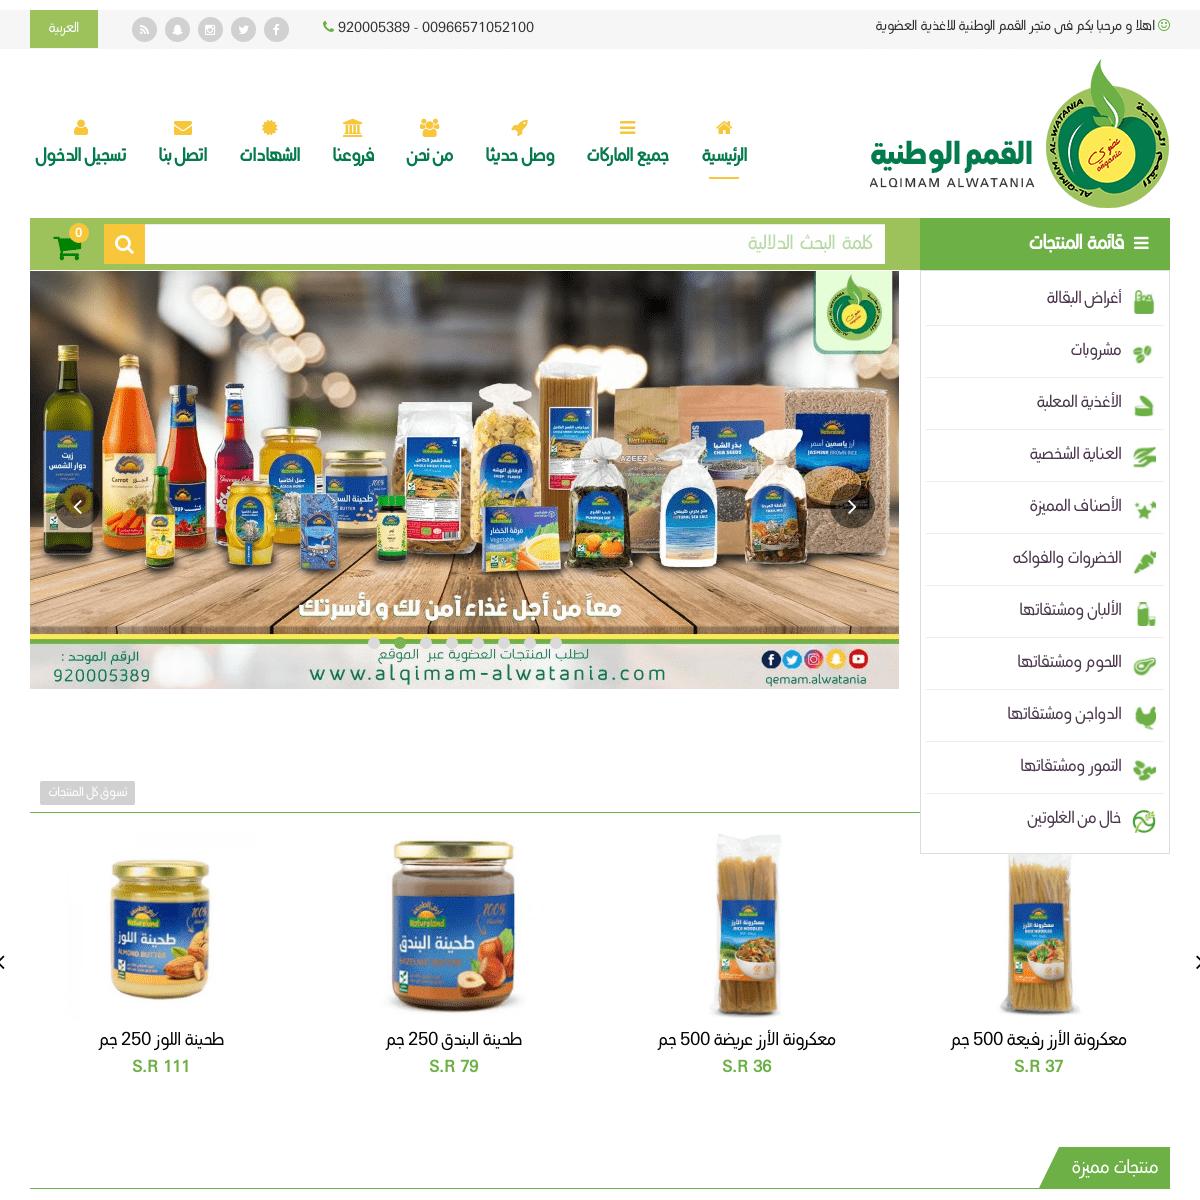 ArchiveBay.com - alqimam-alwatania.com - متجر القمم الوطنية العضوي